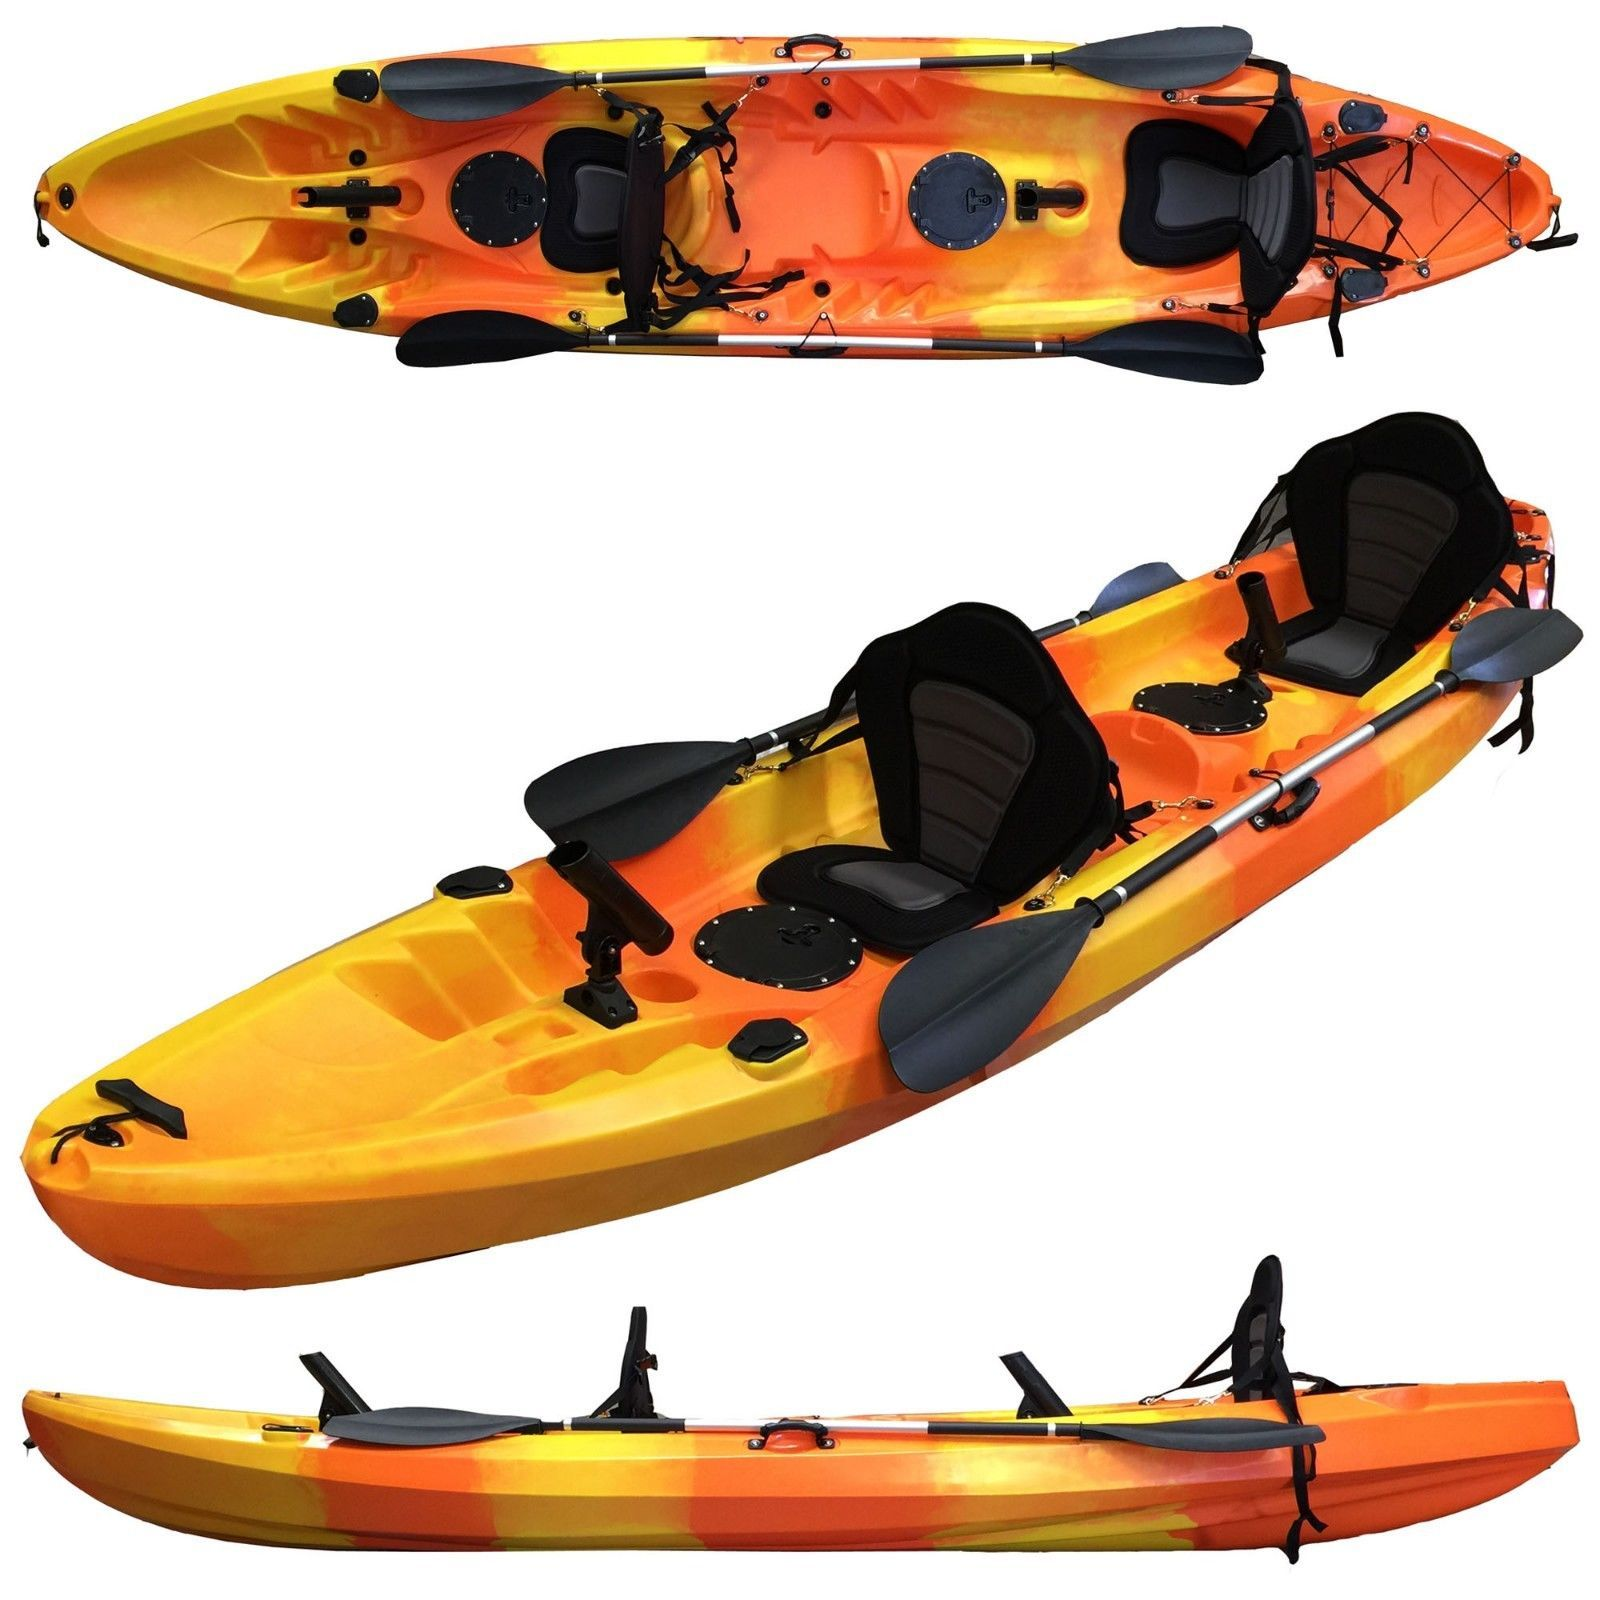 37M 25 Persons Family Double 2 1 Fishing Kayak Canoe 6 Rod Holders Orange